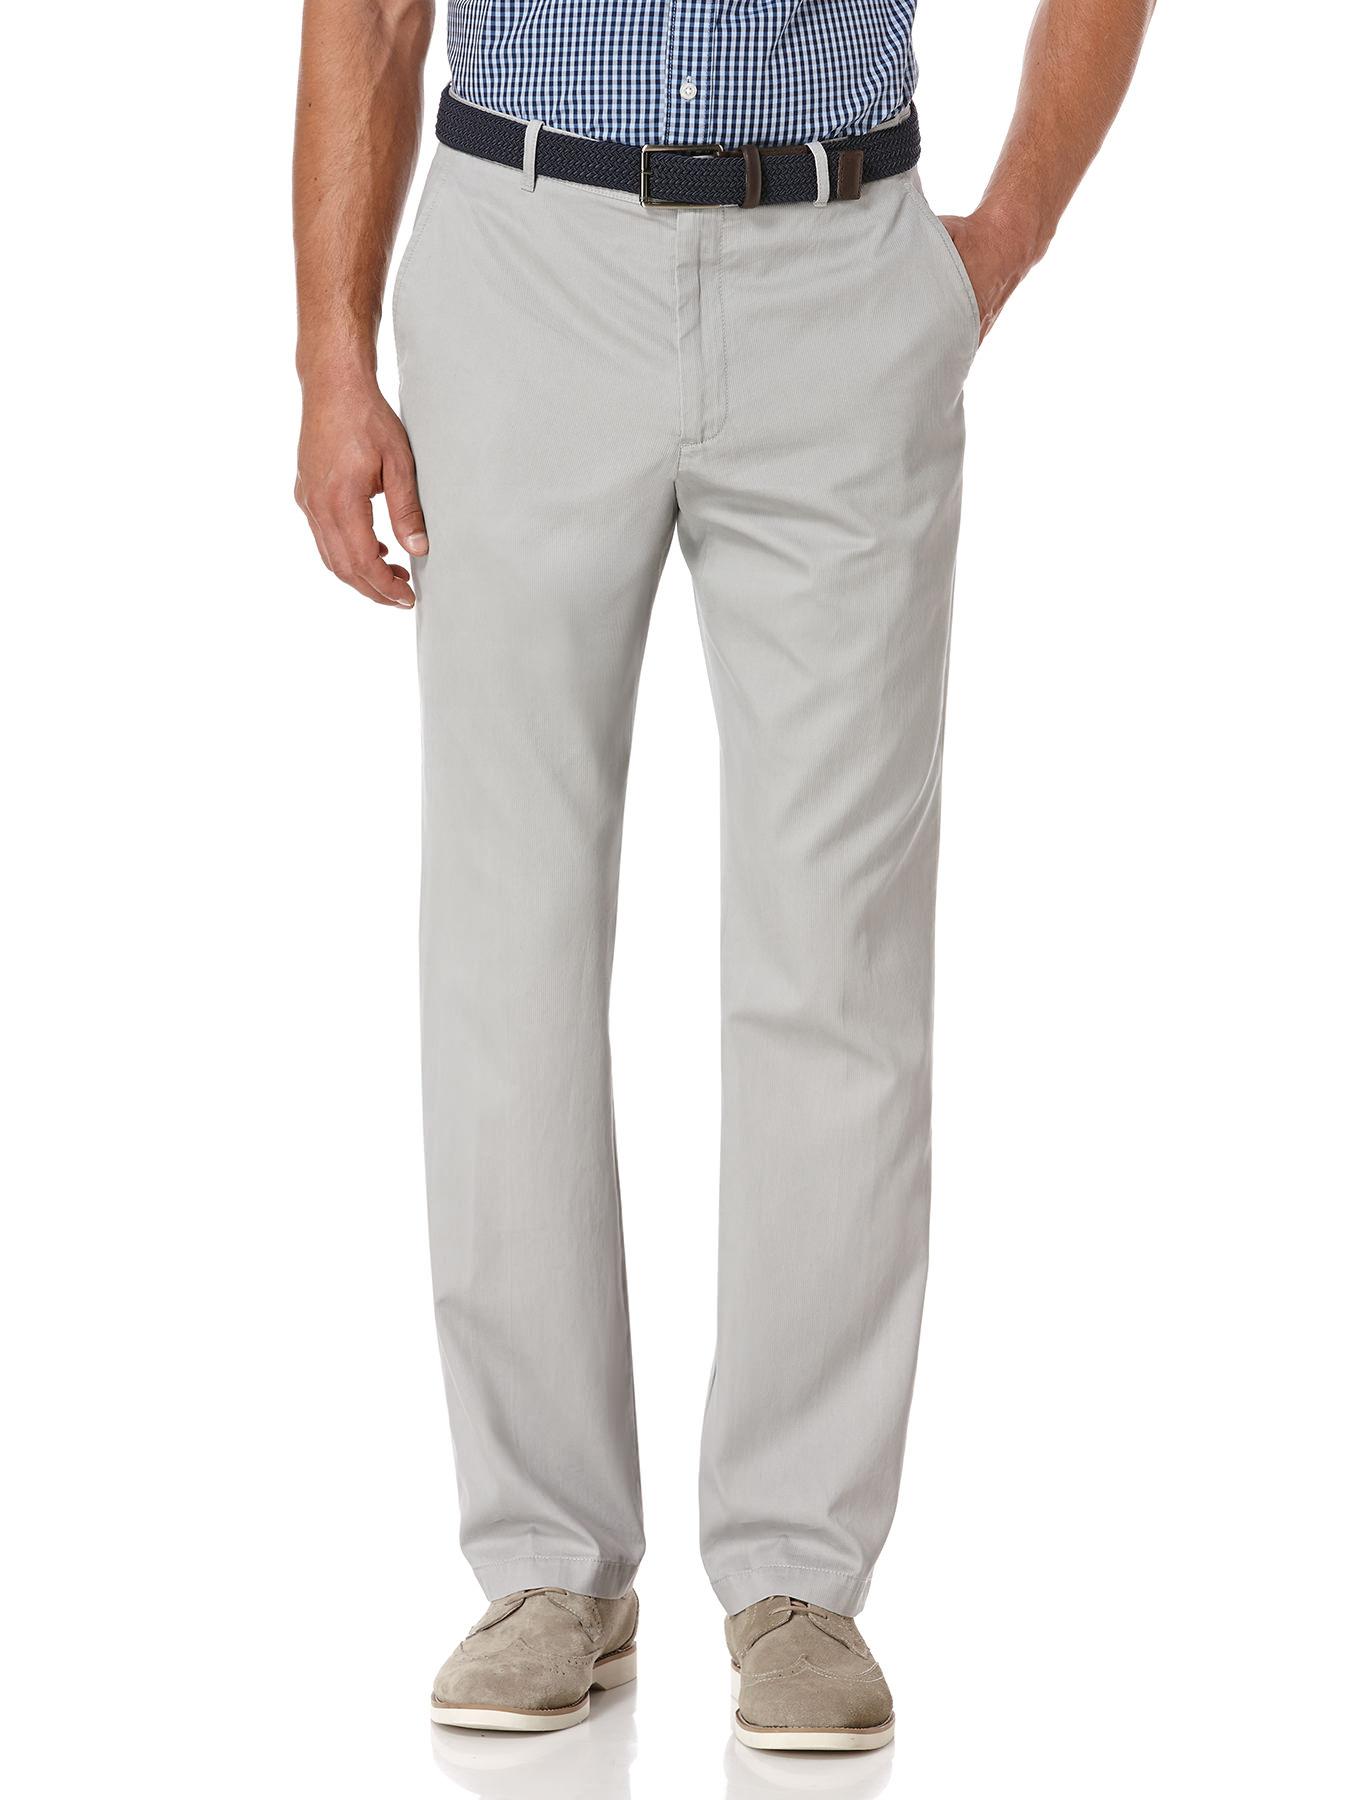 Slim Fit Bedford Cord Pant